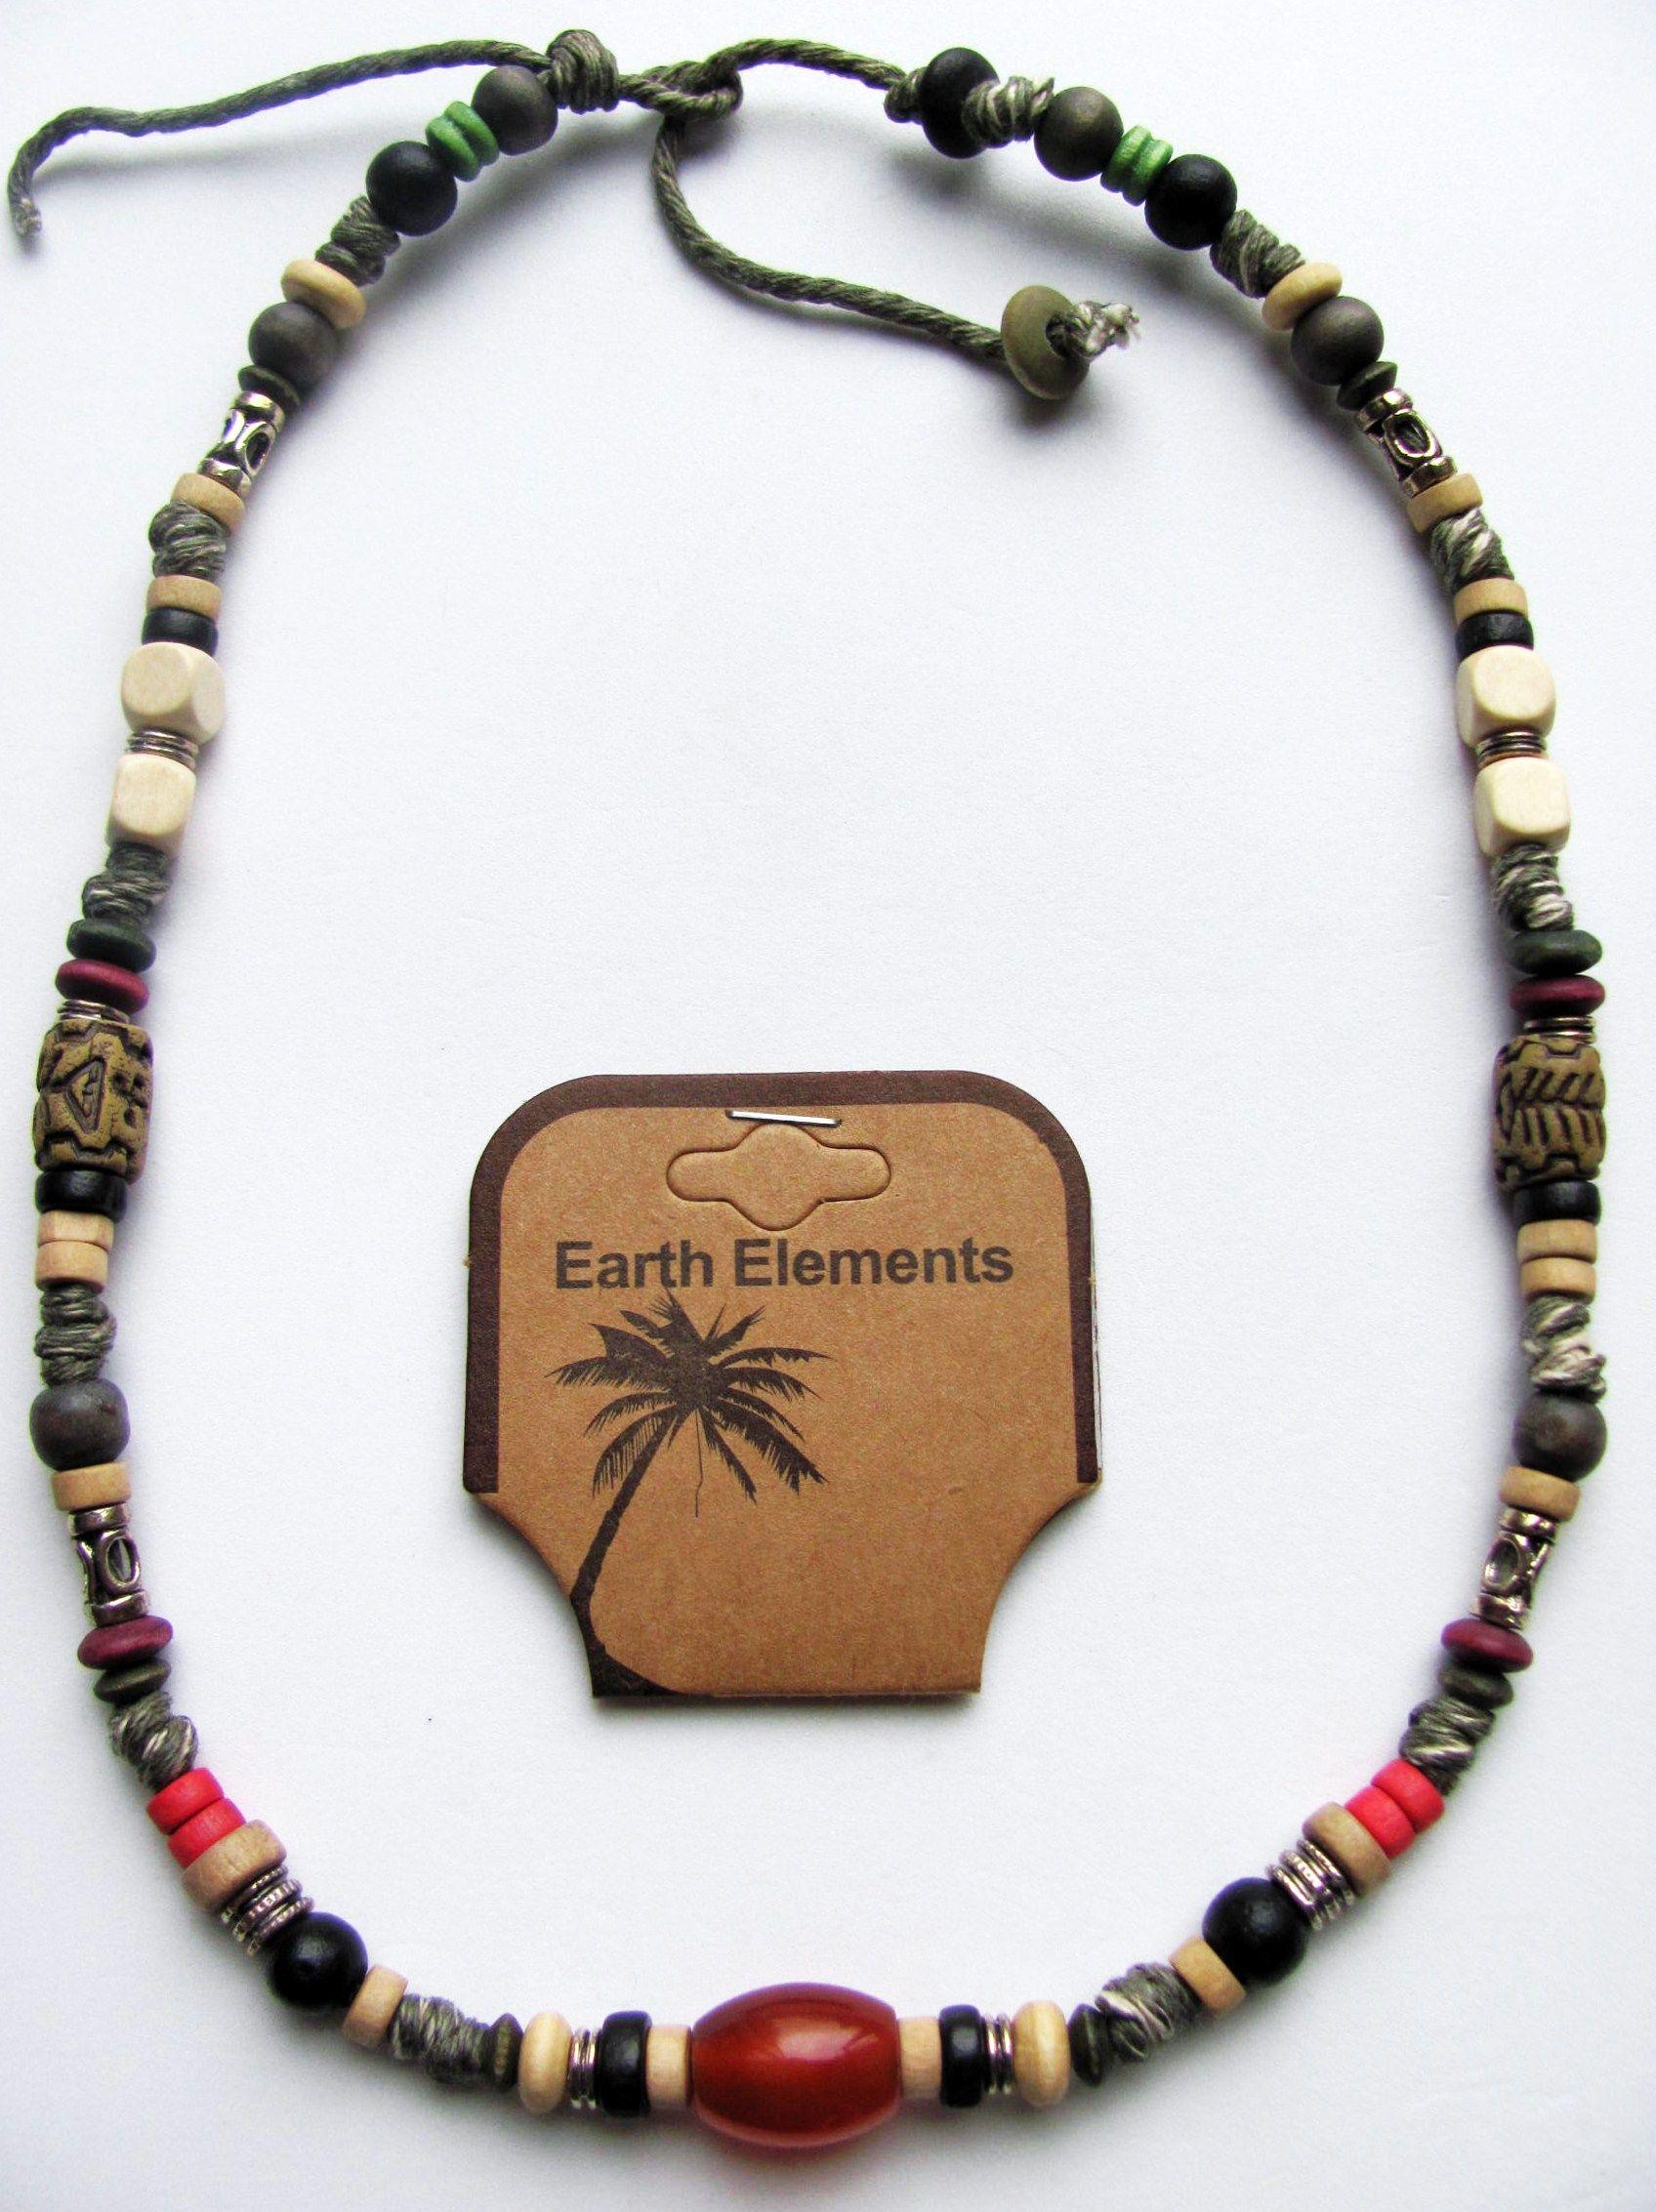 Bahamas Beach Earth Elements Necklace Spiritual Beaded Surfer Mens